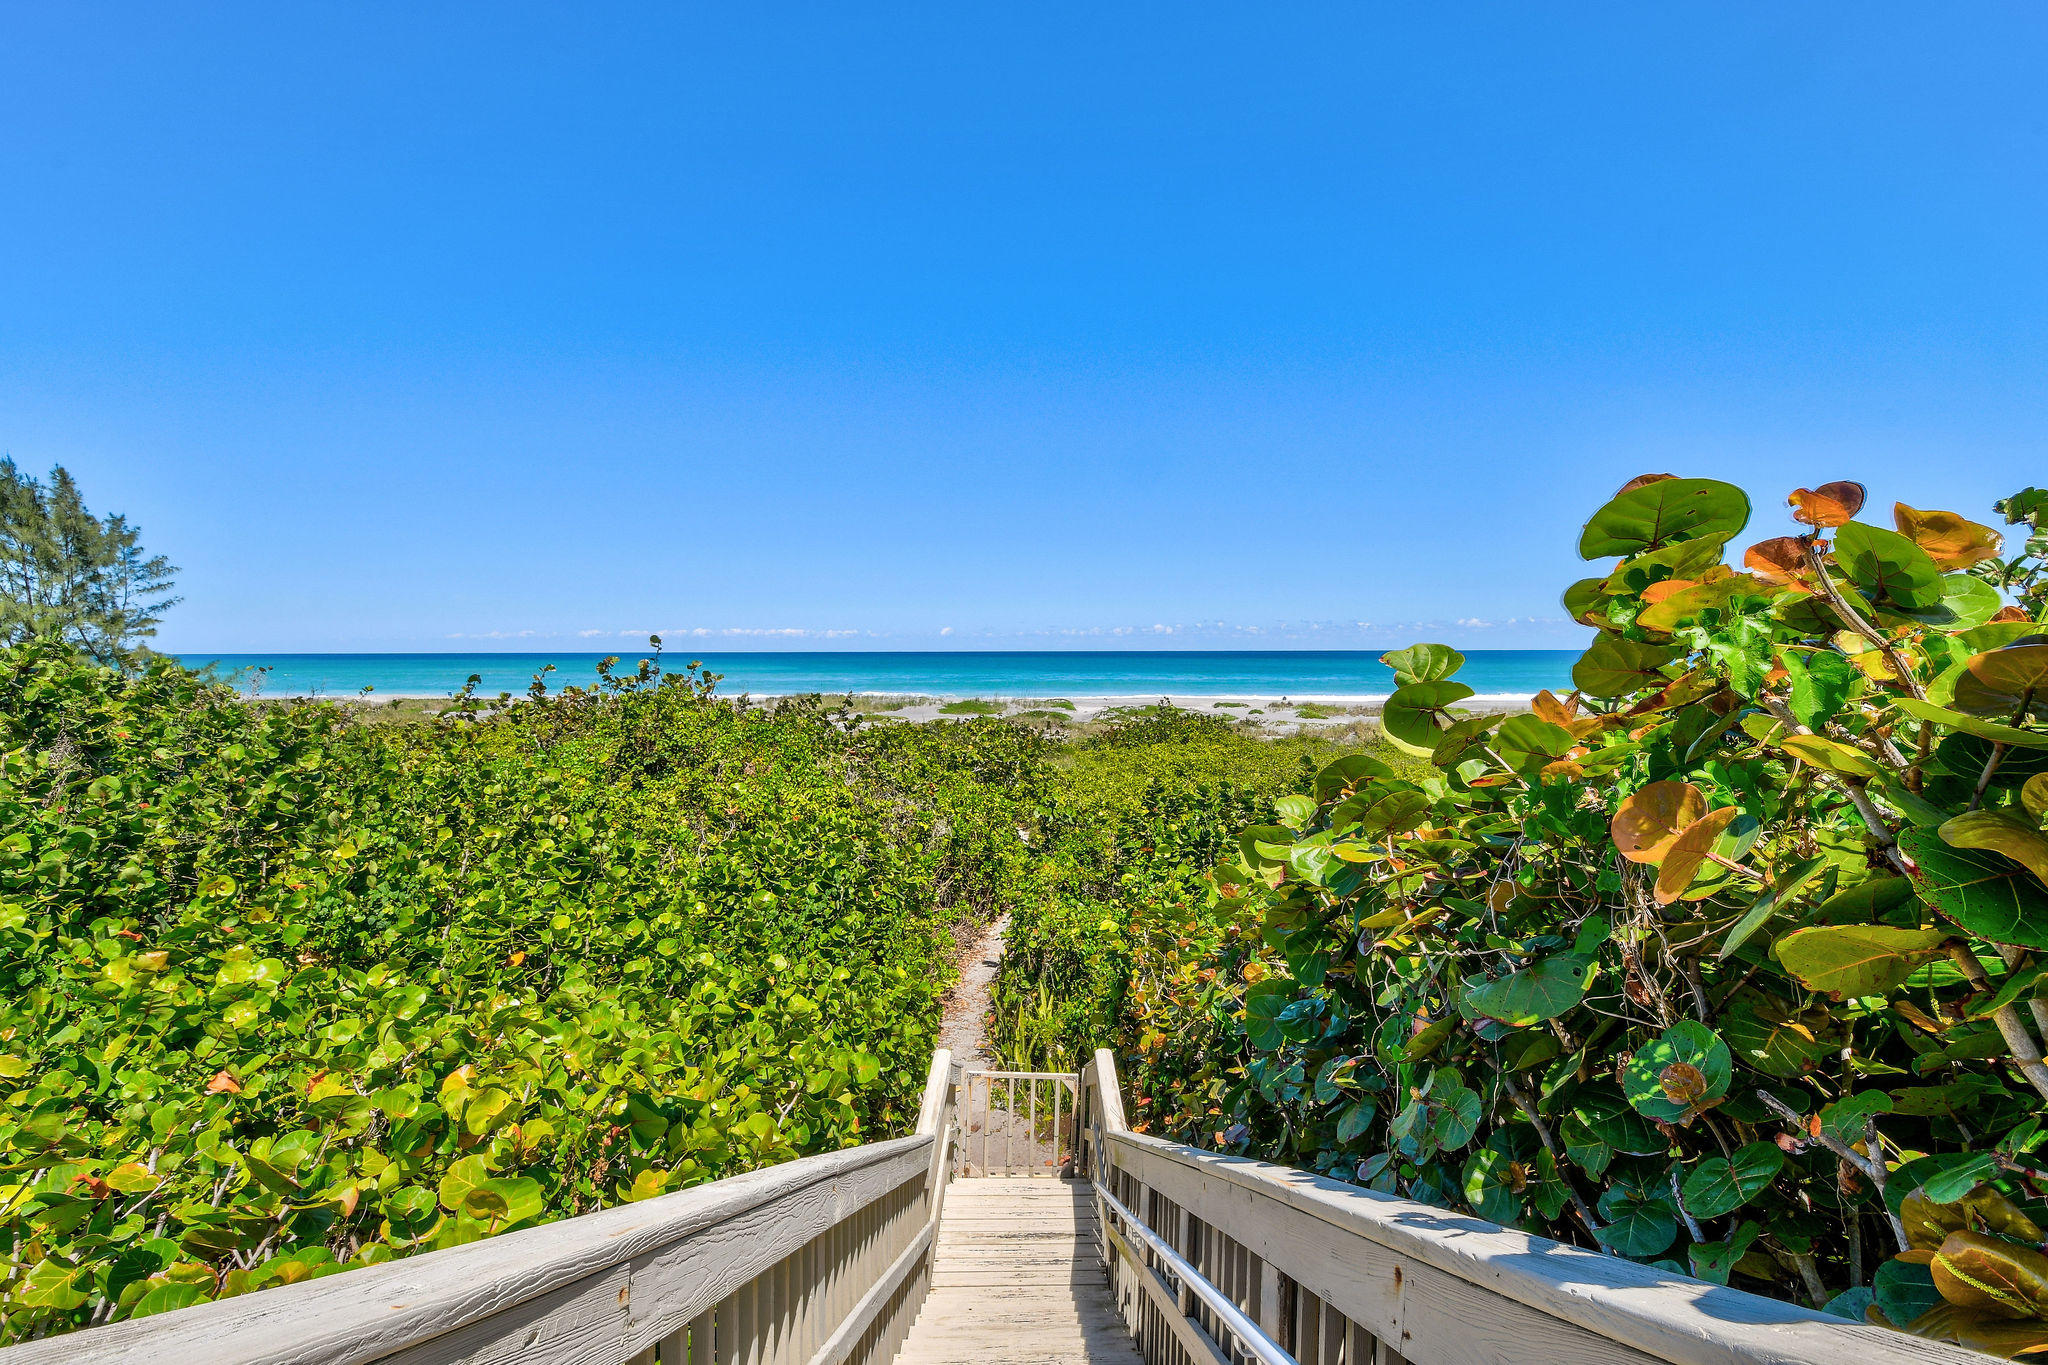 515 S Beach Road Hobe Sound, FL 33455